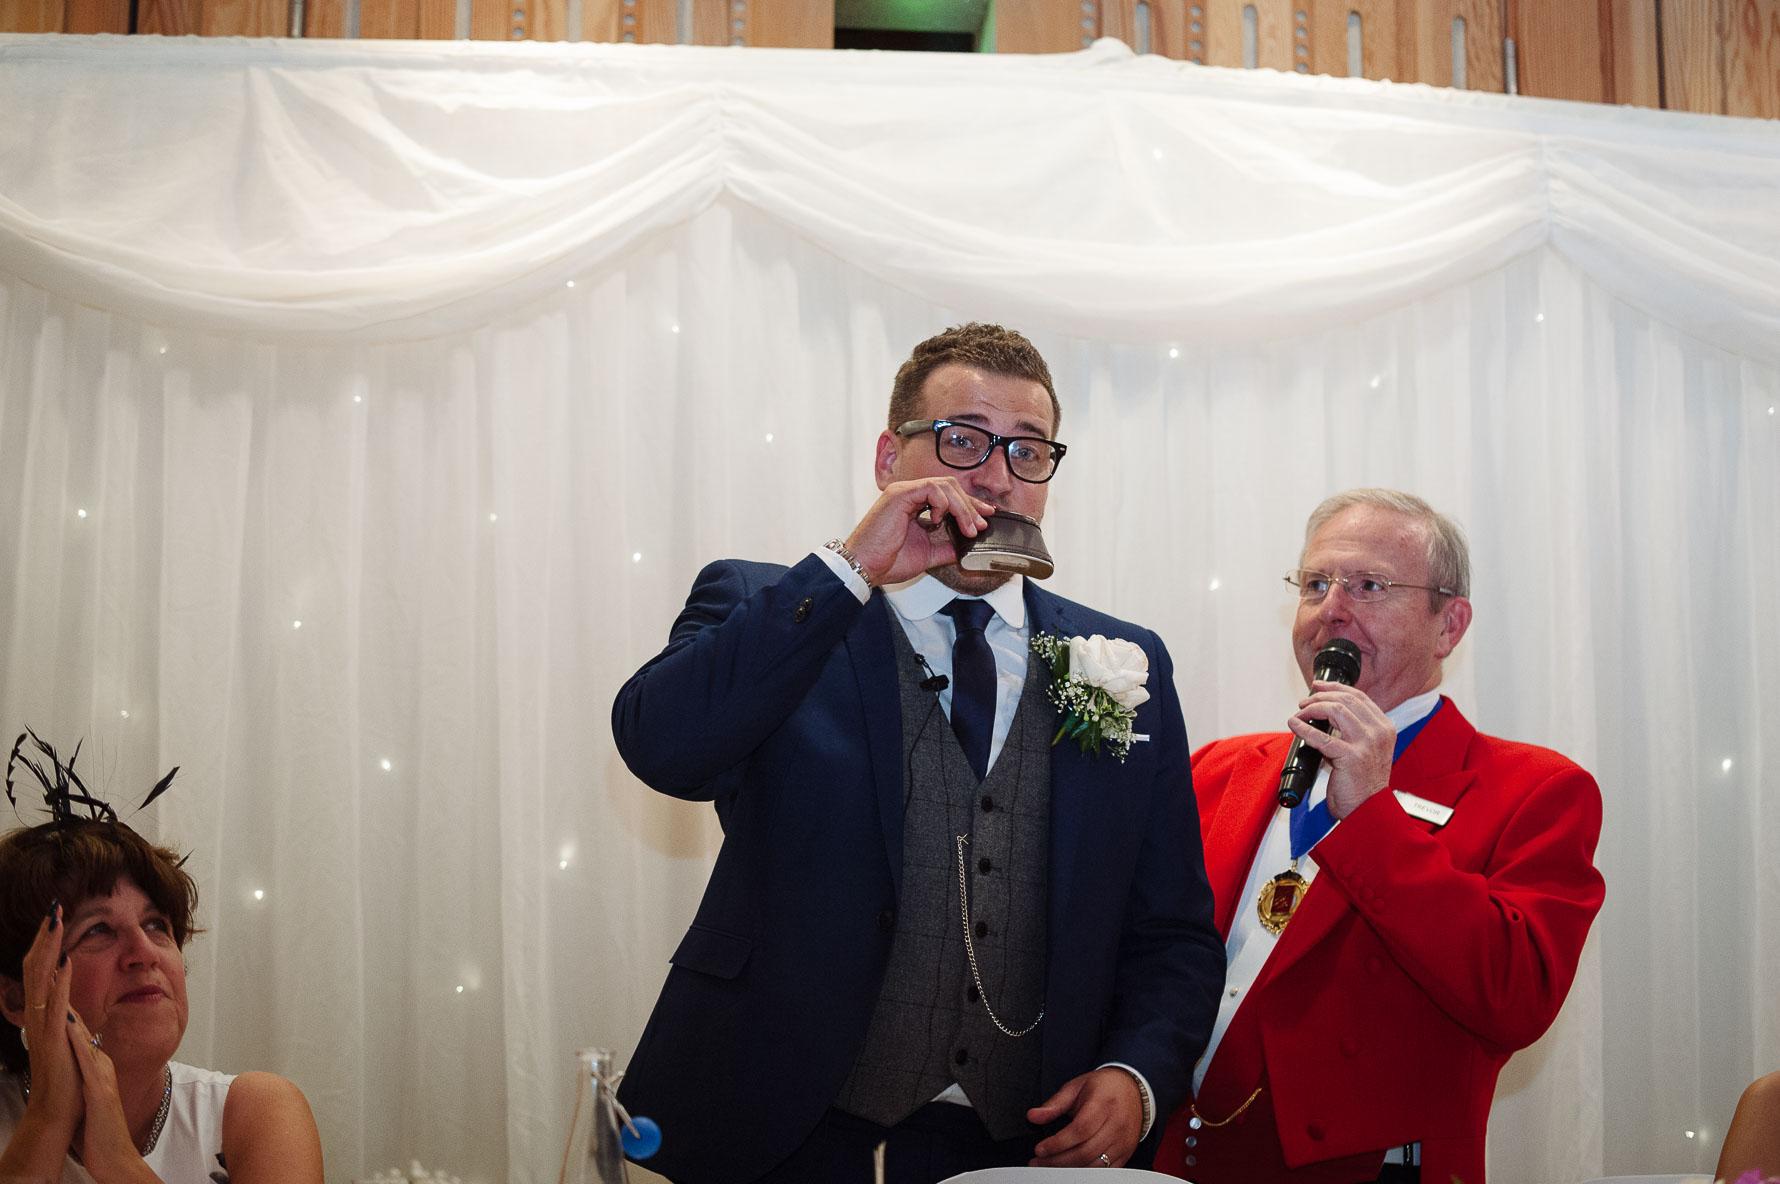 Canterbury Cathedral Lodge Wedding88-20141004 1625